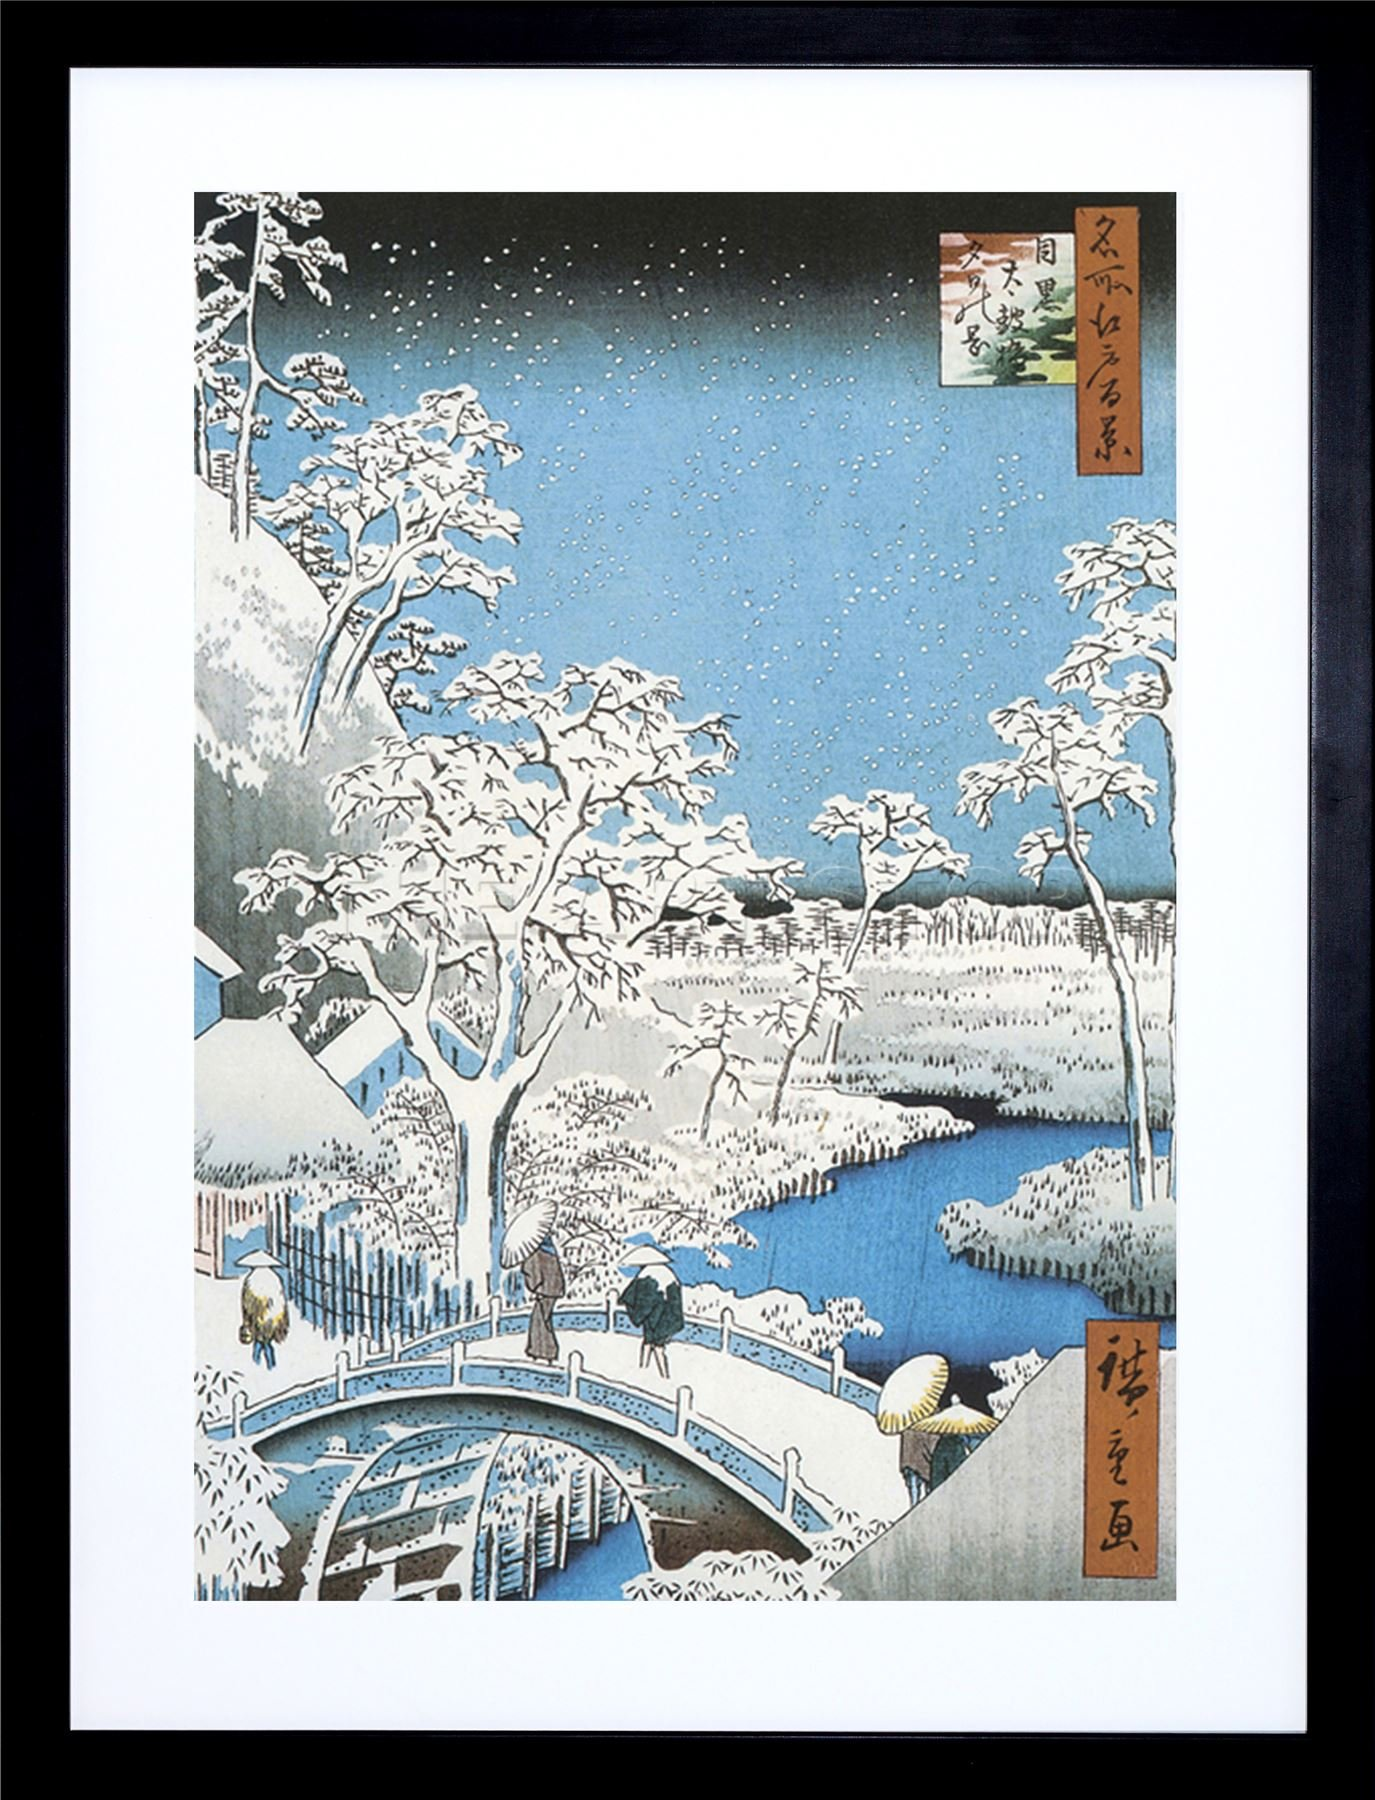 9x7 '' PAINTING JAPANESE WOODBLOCK BRIDGE OVER RIVER FRAMED ART PRINT F97X688